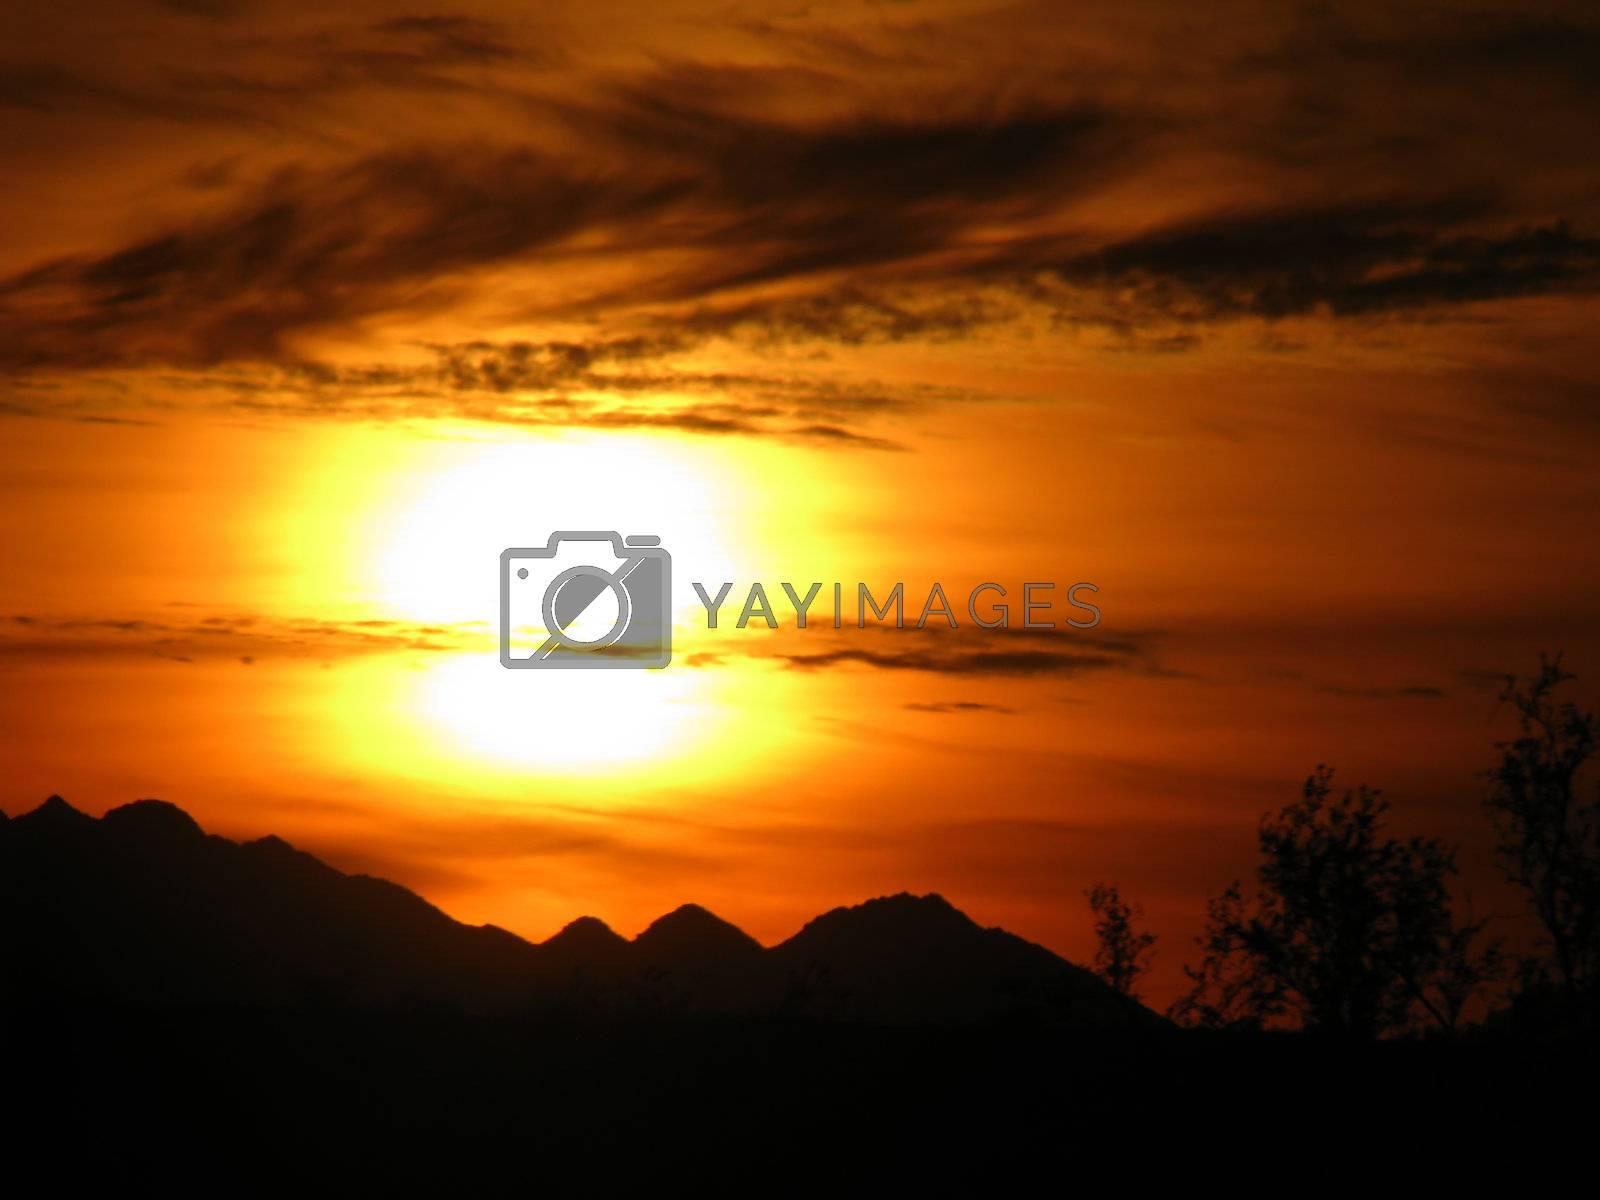 Royalty free image of Arizona Desert Sunset v2 by mwp1969